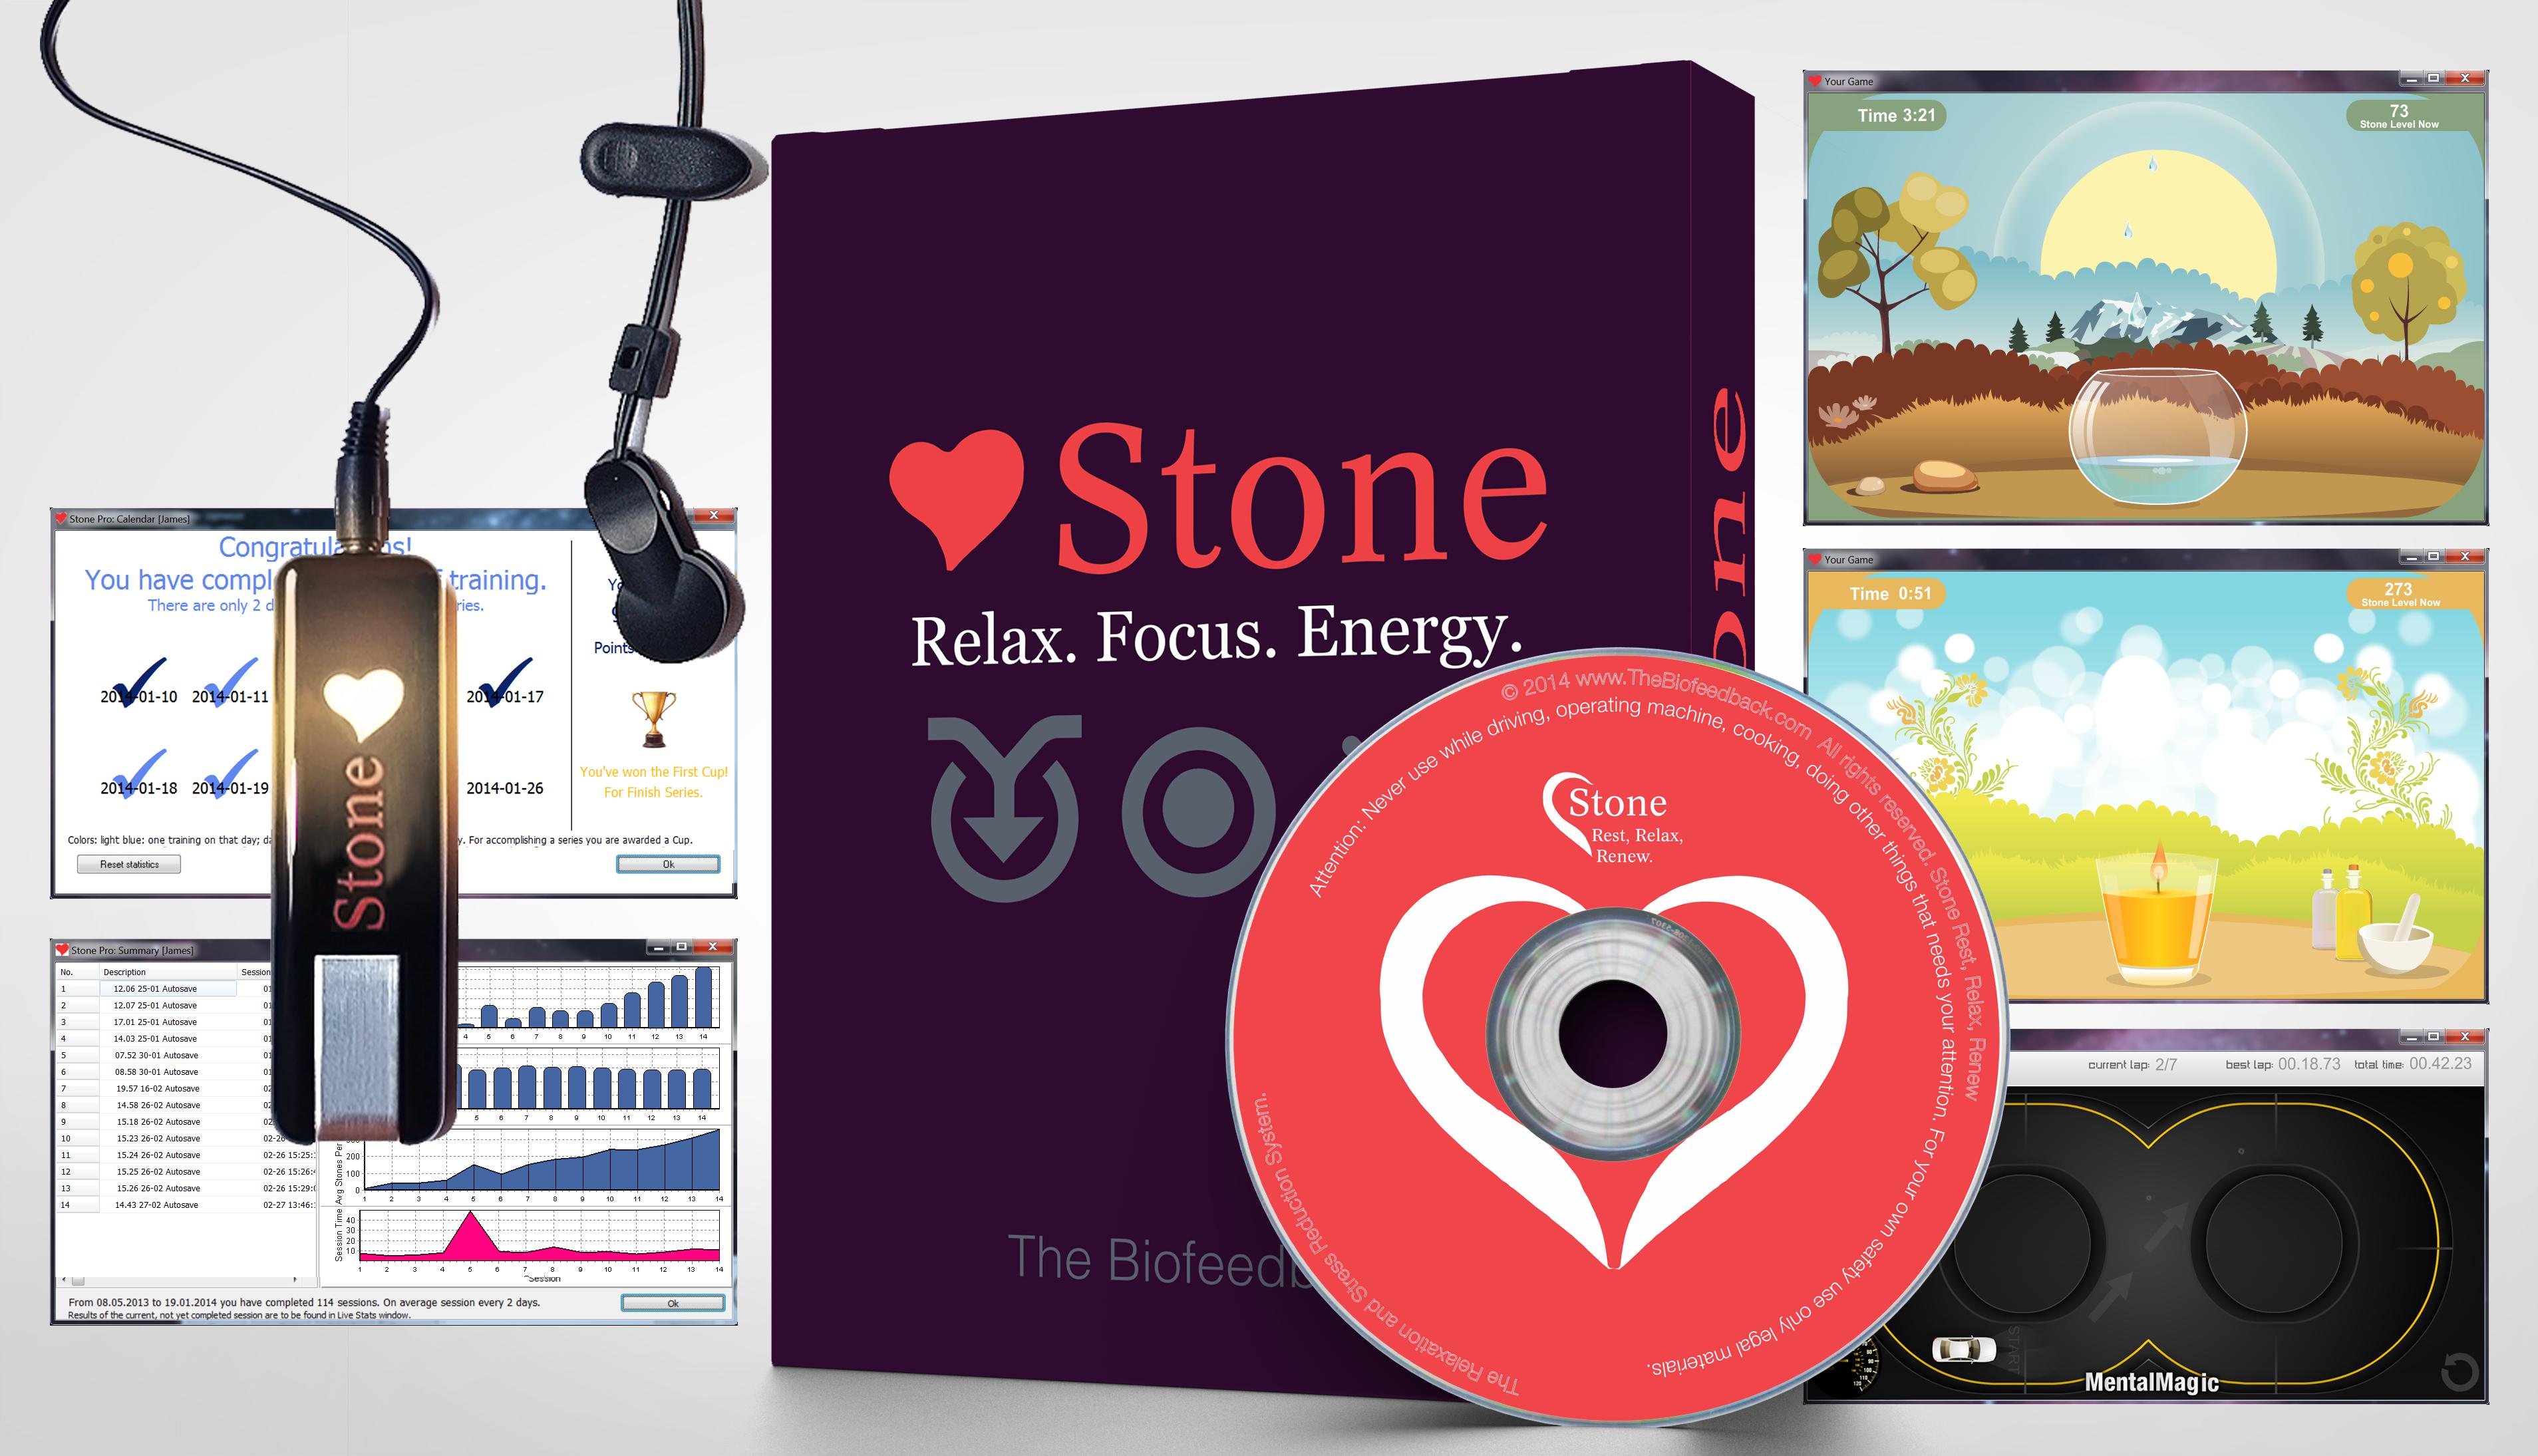 Stone Full Set: Biofeedback Device, Sensor, Games